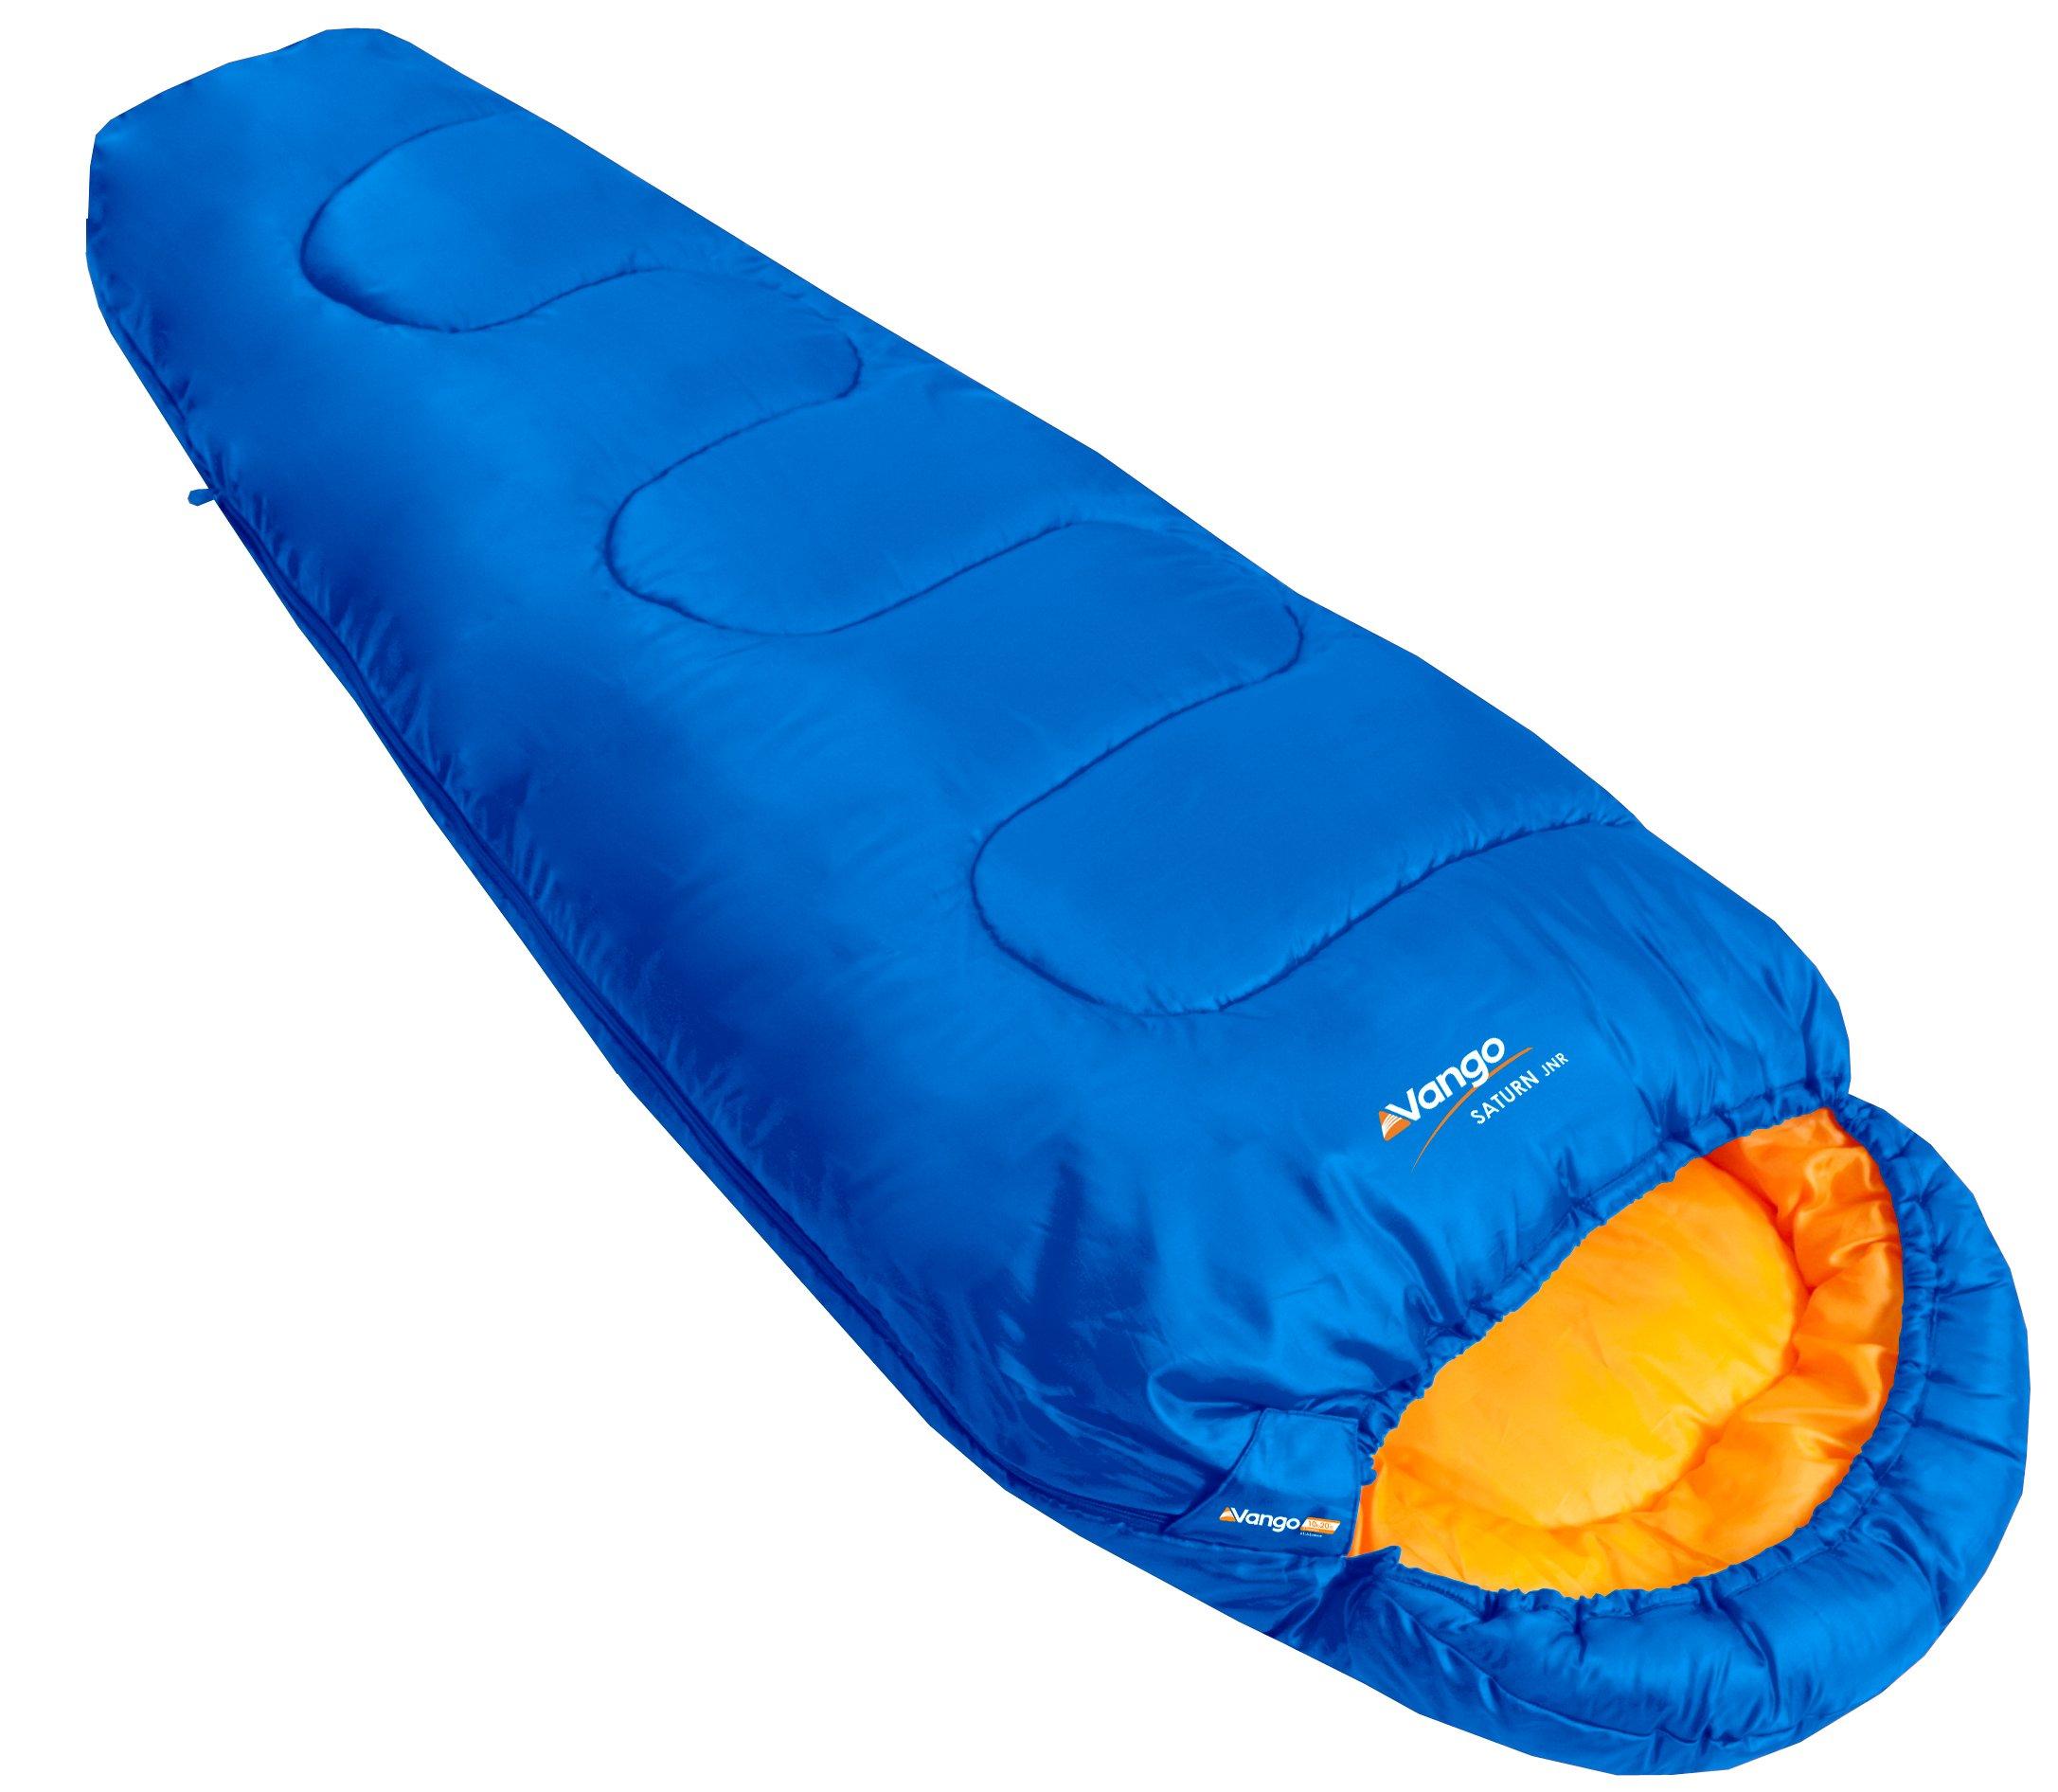 Vango Saturn Kids' Outdoor Sleeping Bag available in Atlantic - Size 170 x 70 cm 1